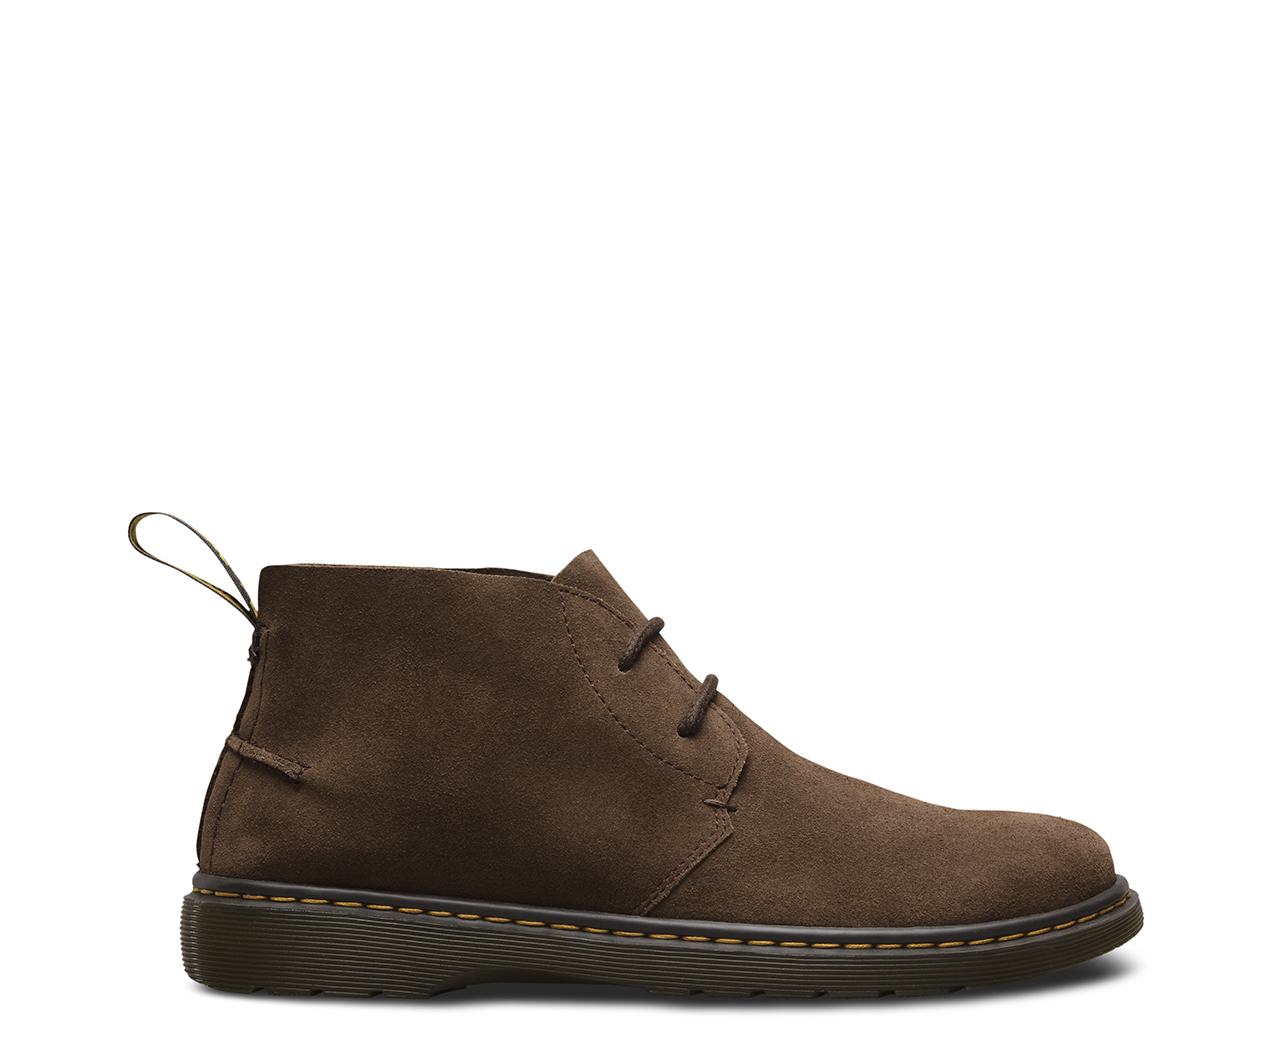 Dr.Martens Womens Lorrie II Virginia Brown Leather Shoes 41 EU paWQCqXCB